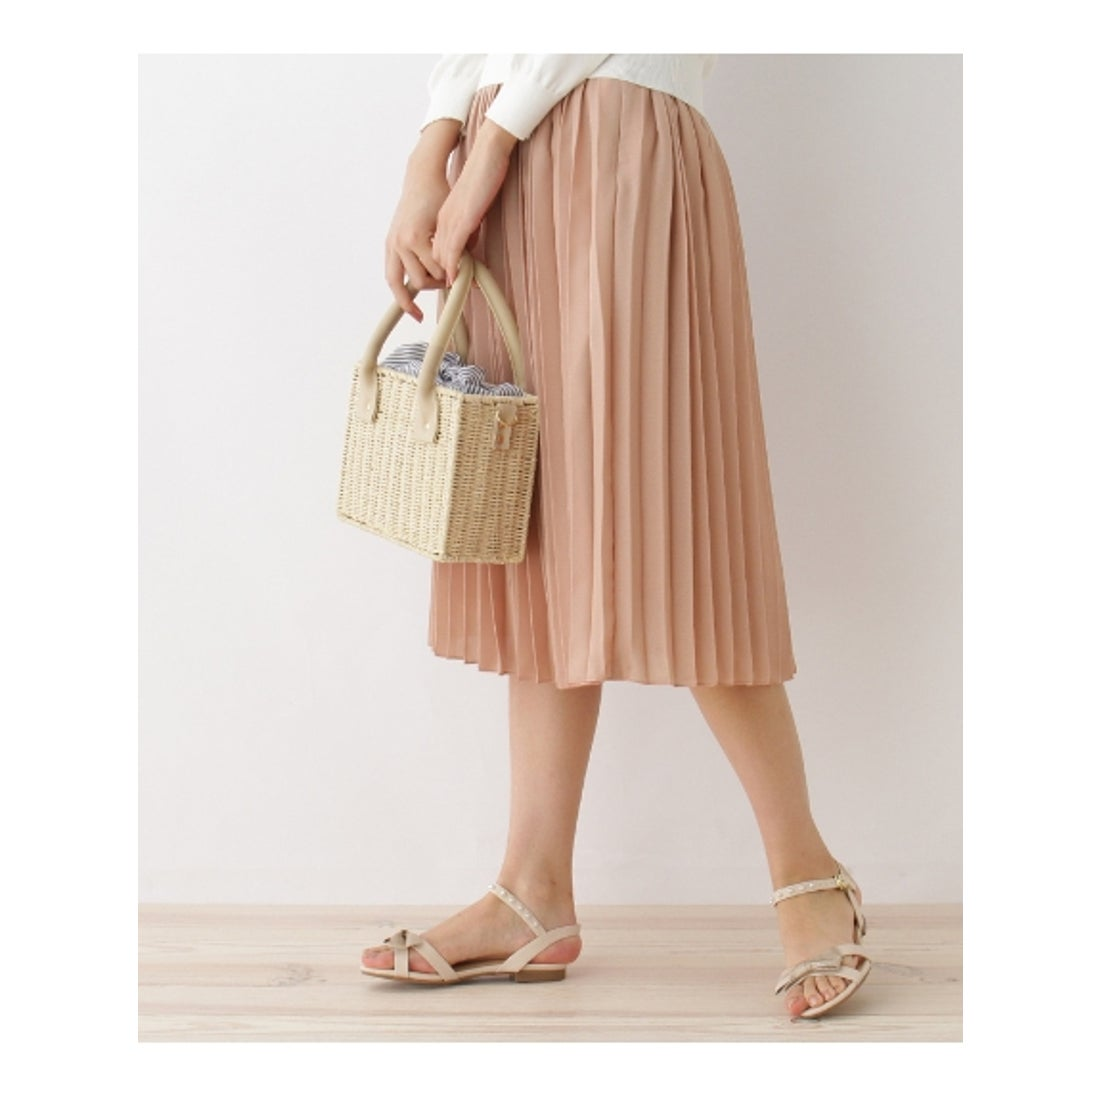 【SALE 73%OFF】クチュール ブローチ Couture brooch 【WEB限定プライス】デザインベルトプリーツスカート (ピンク)